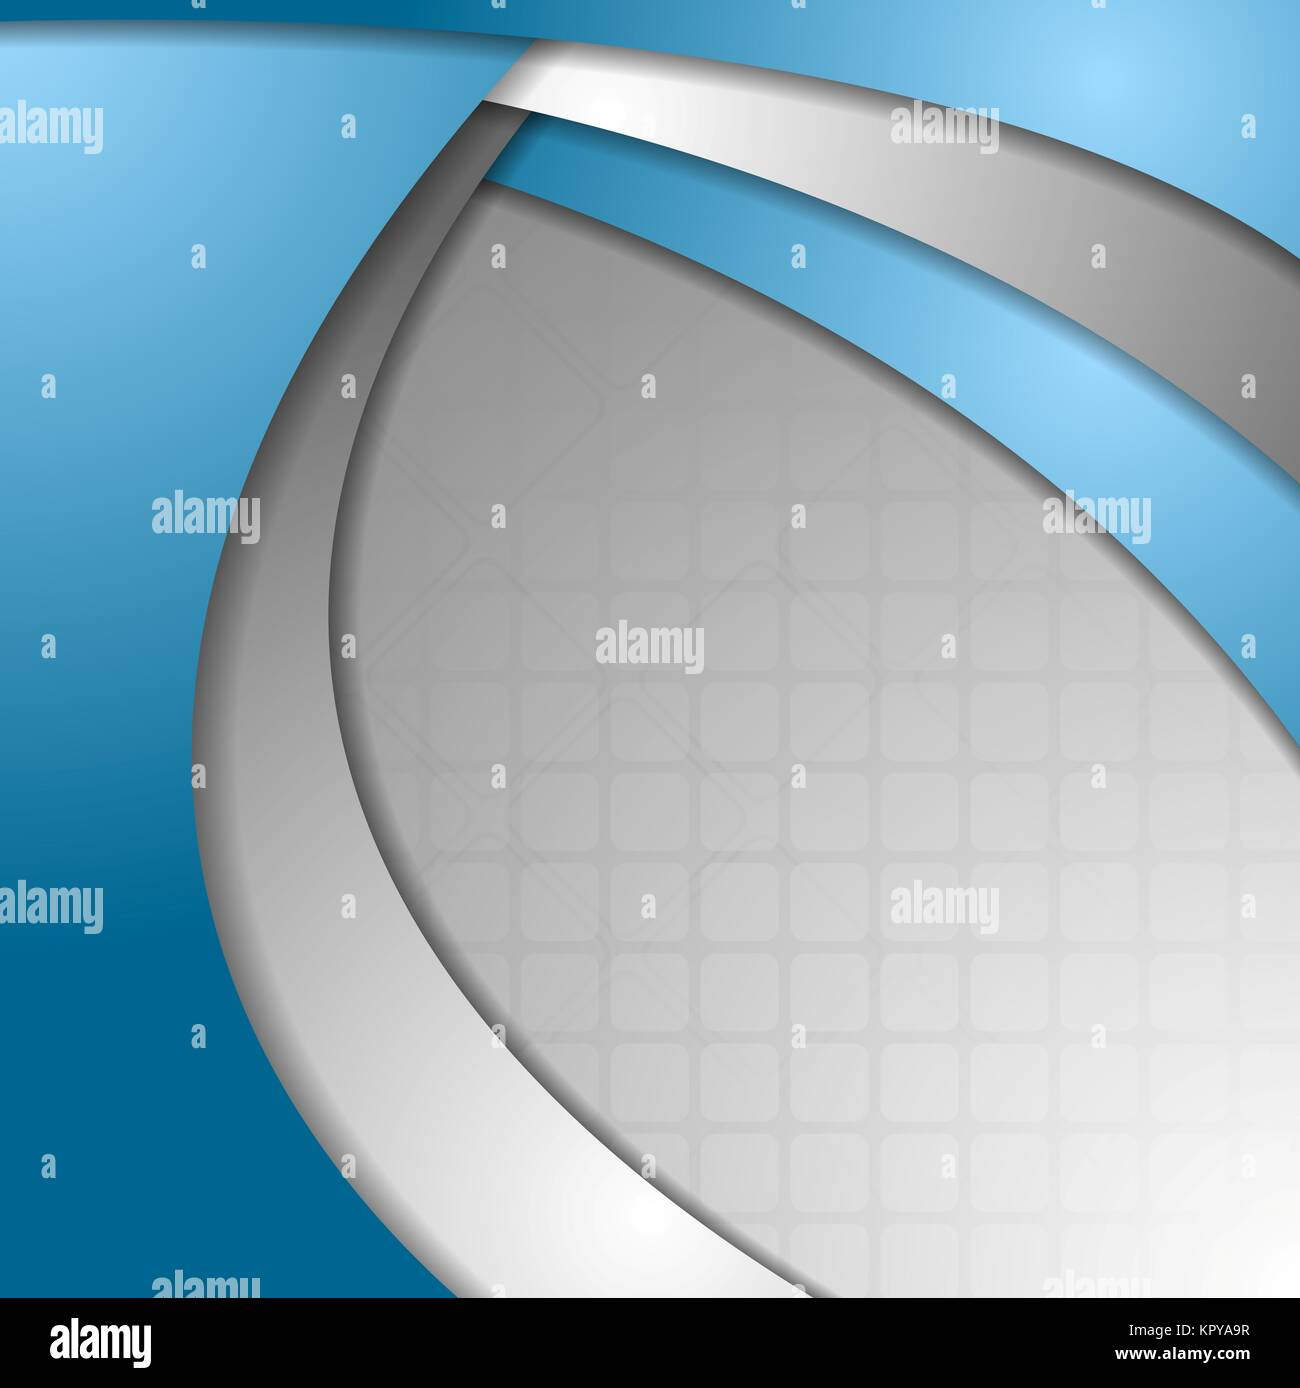 Grey Wavy Gradient Background Wallpaper Stock Photos & Grey Wavy ...